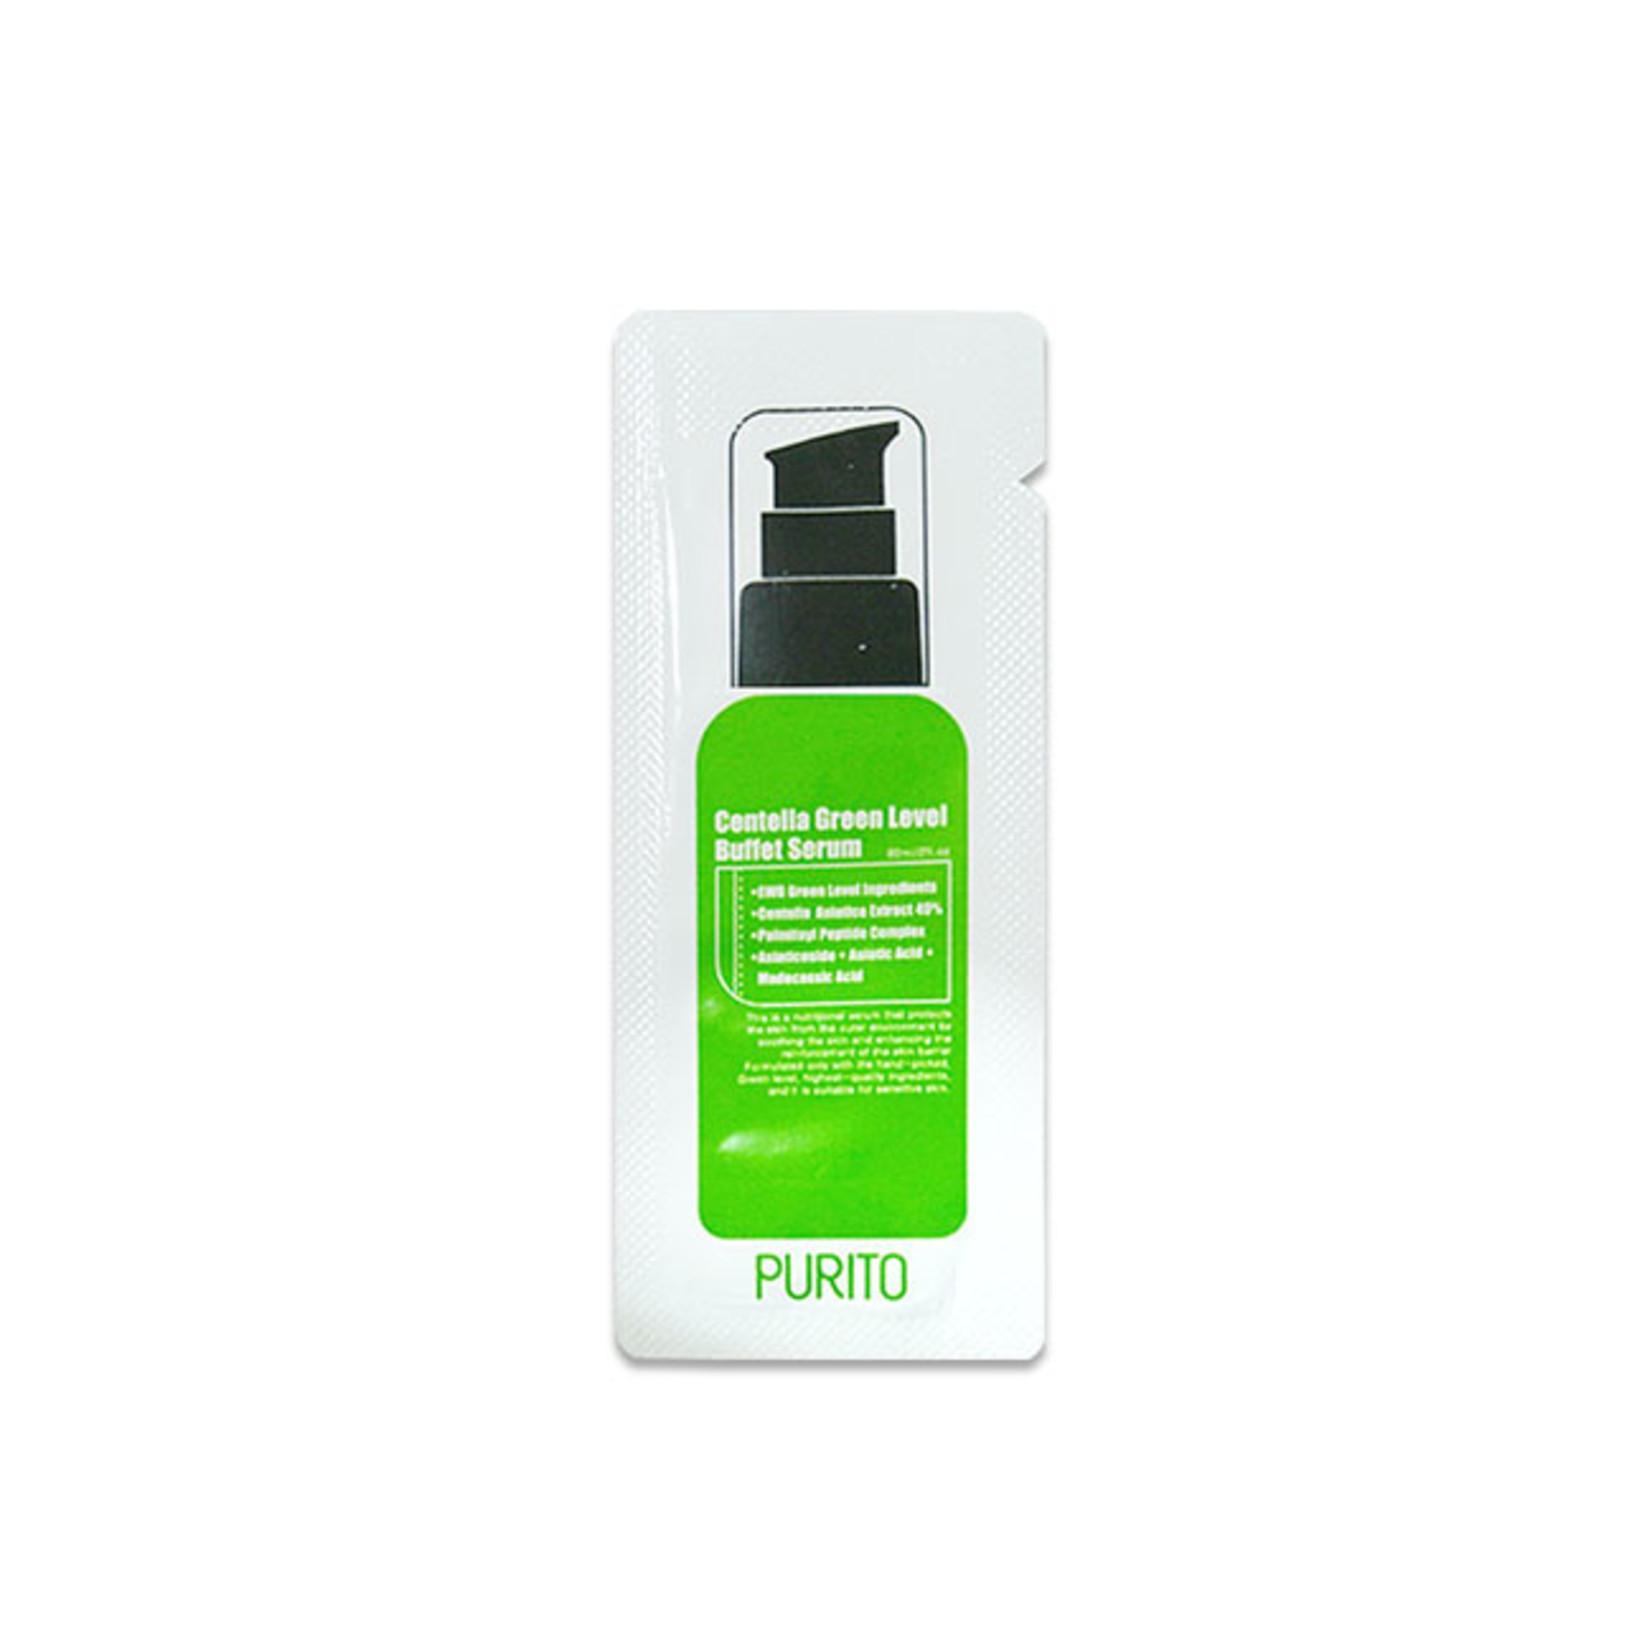 Purito Centella Green Level Buffet Serum Sample 50pcs